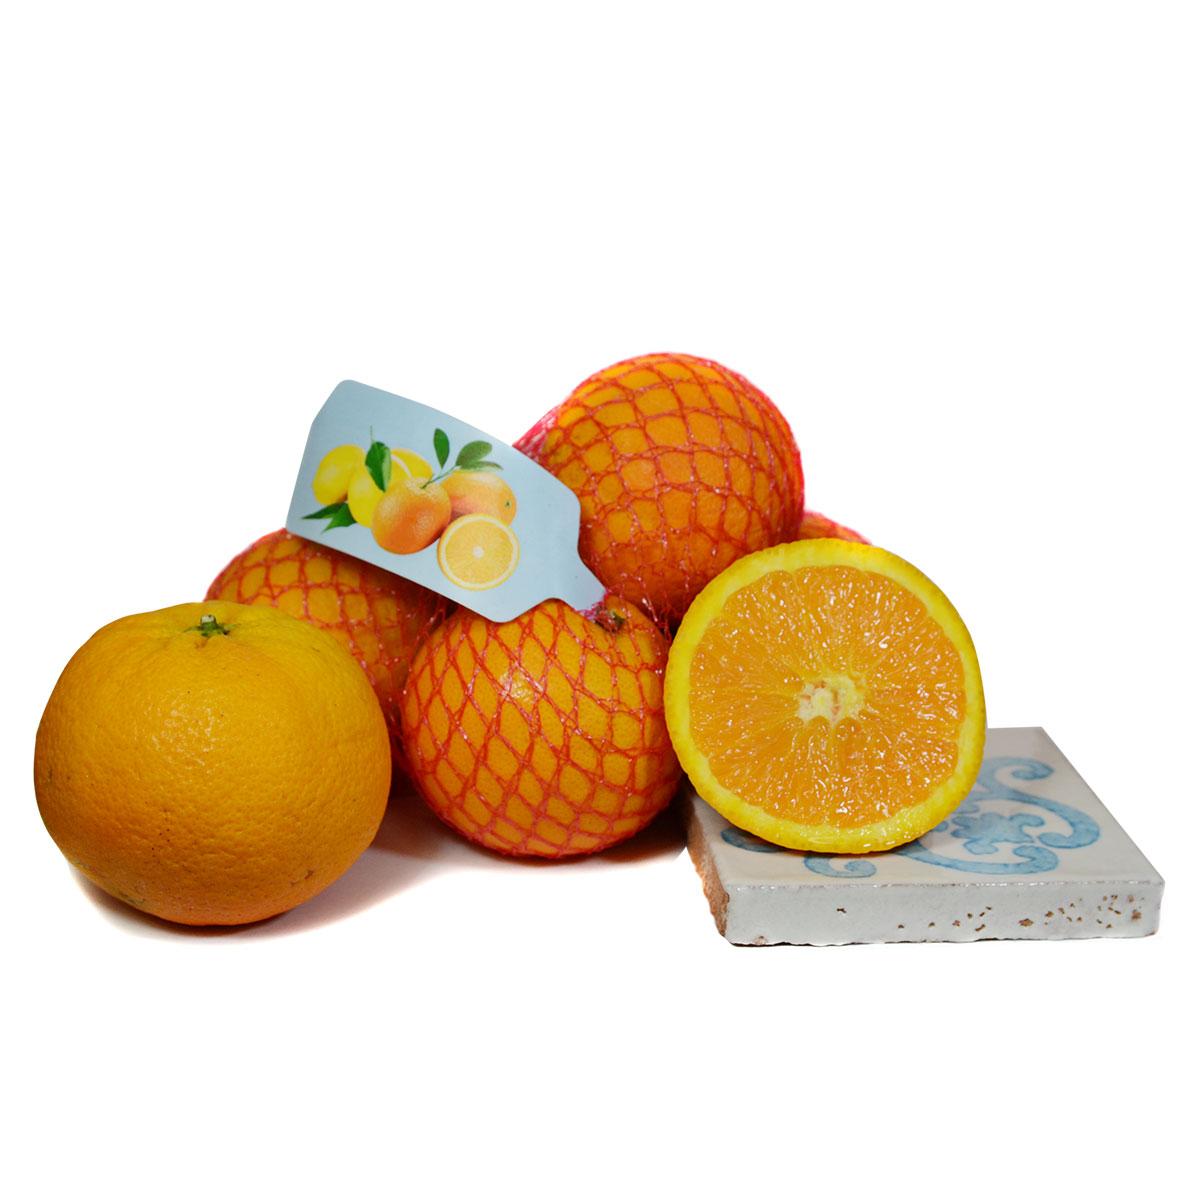 anemosbio-prodotti-biologici-rete-arance biologiche